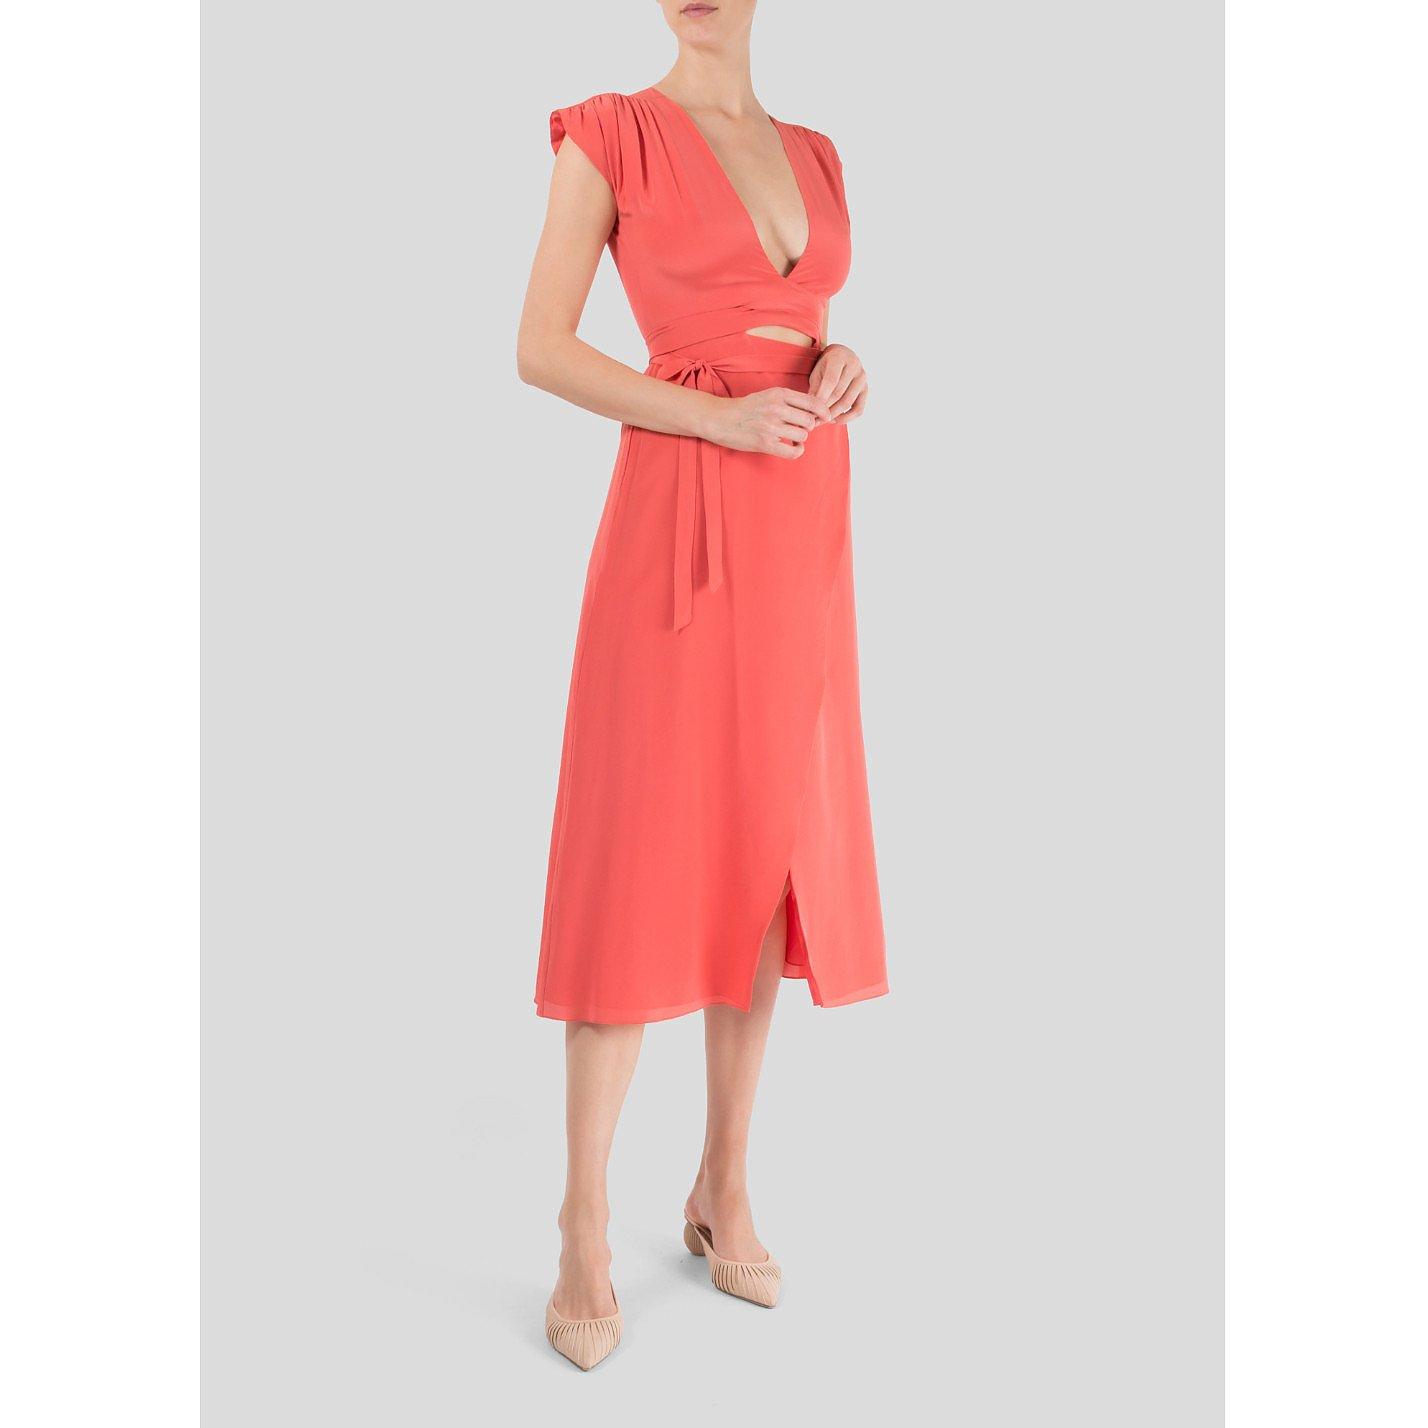 Tephi Florence Dress